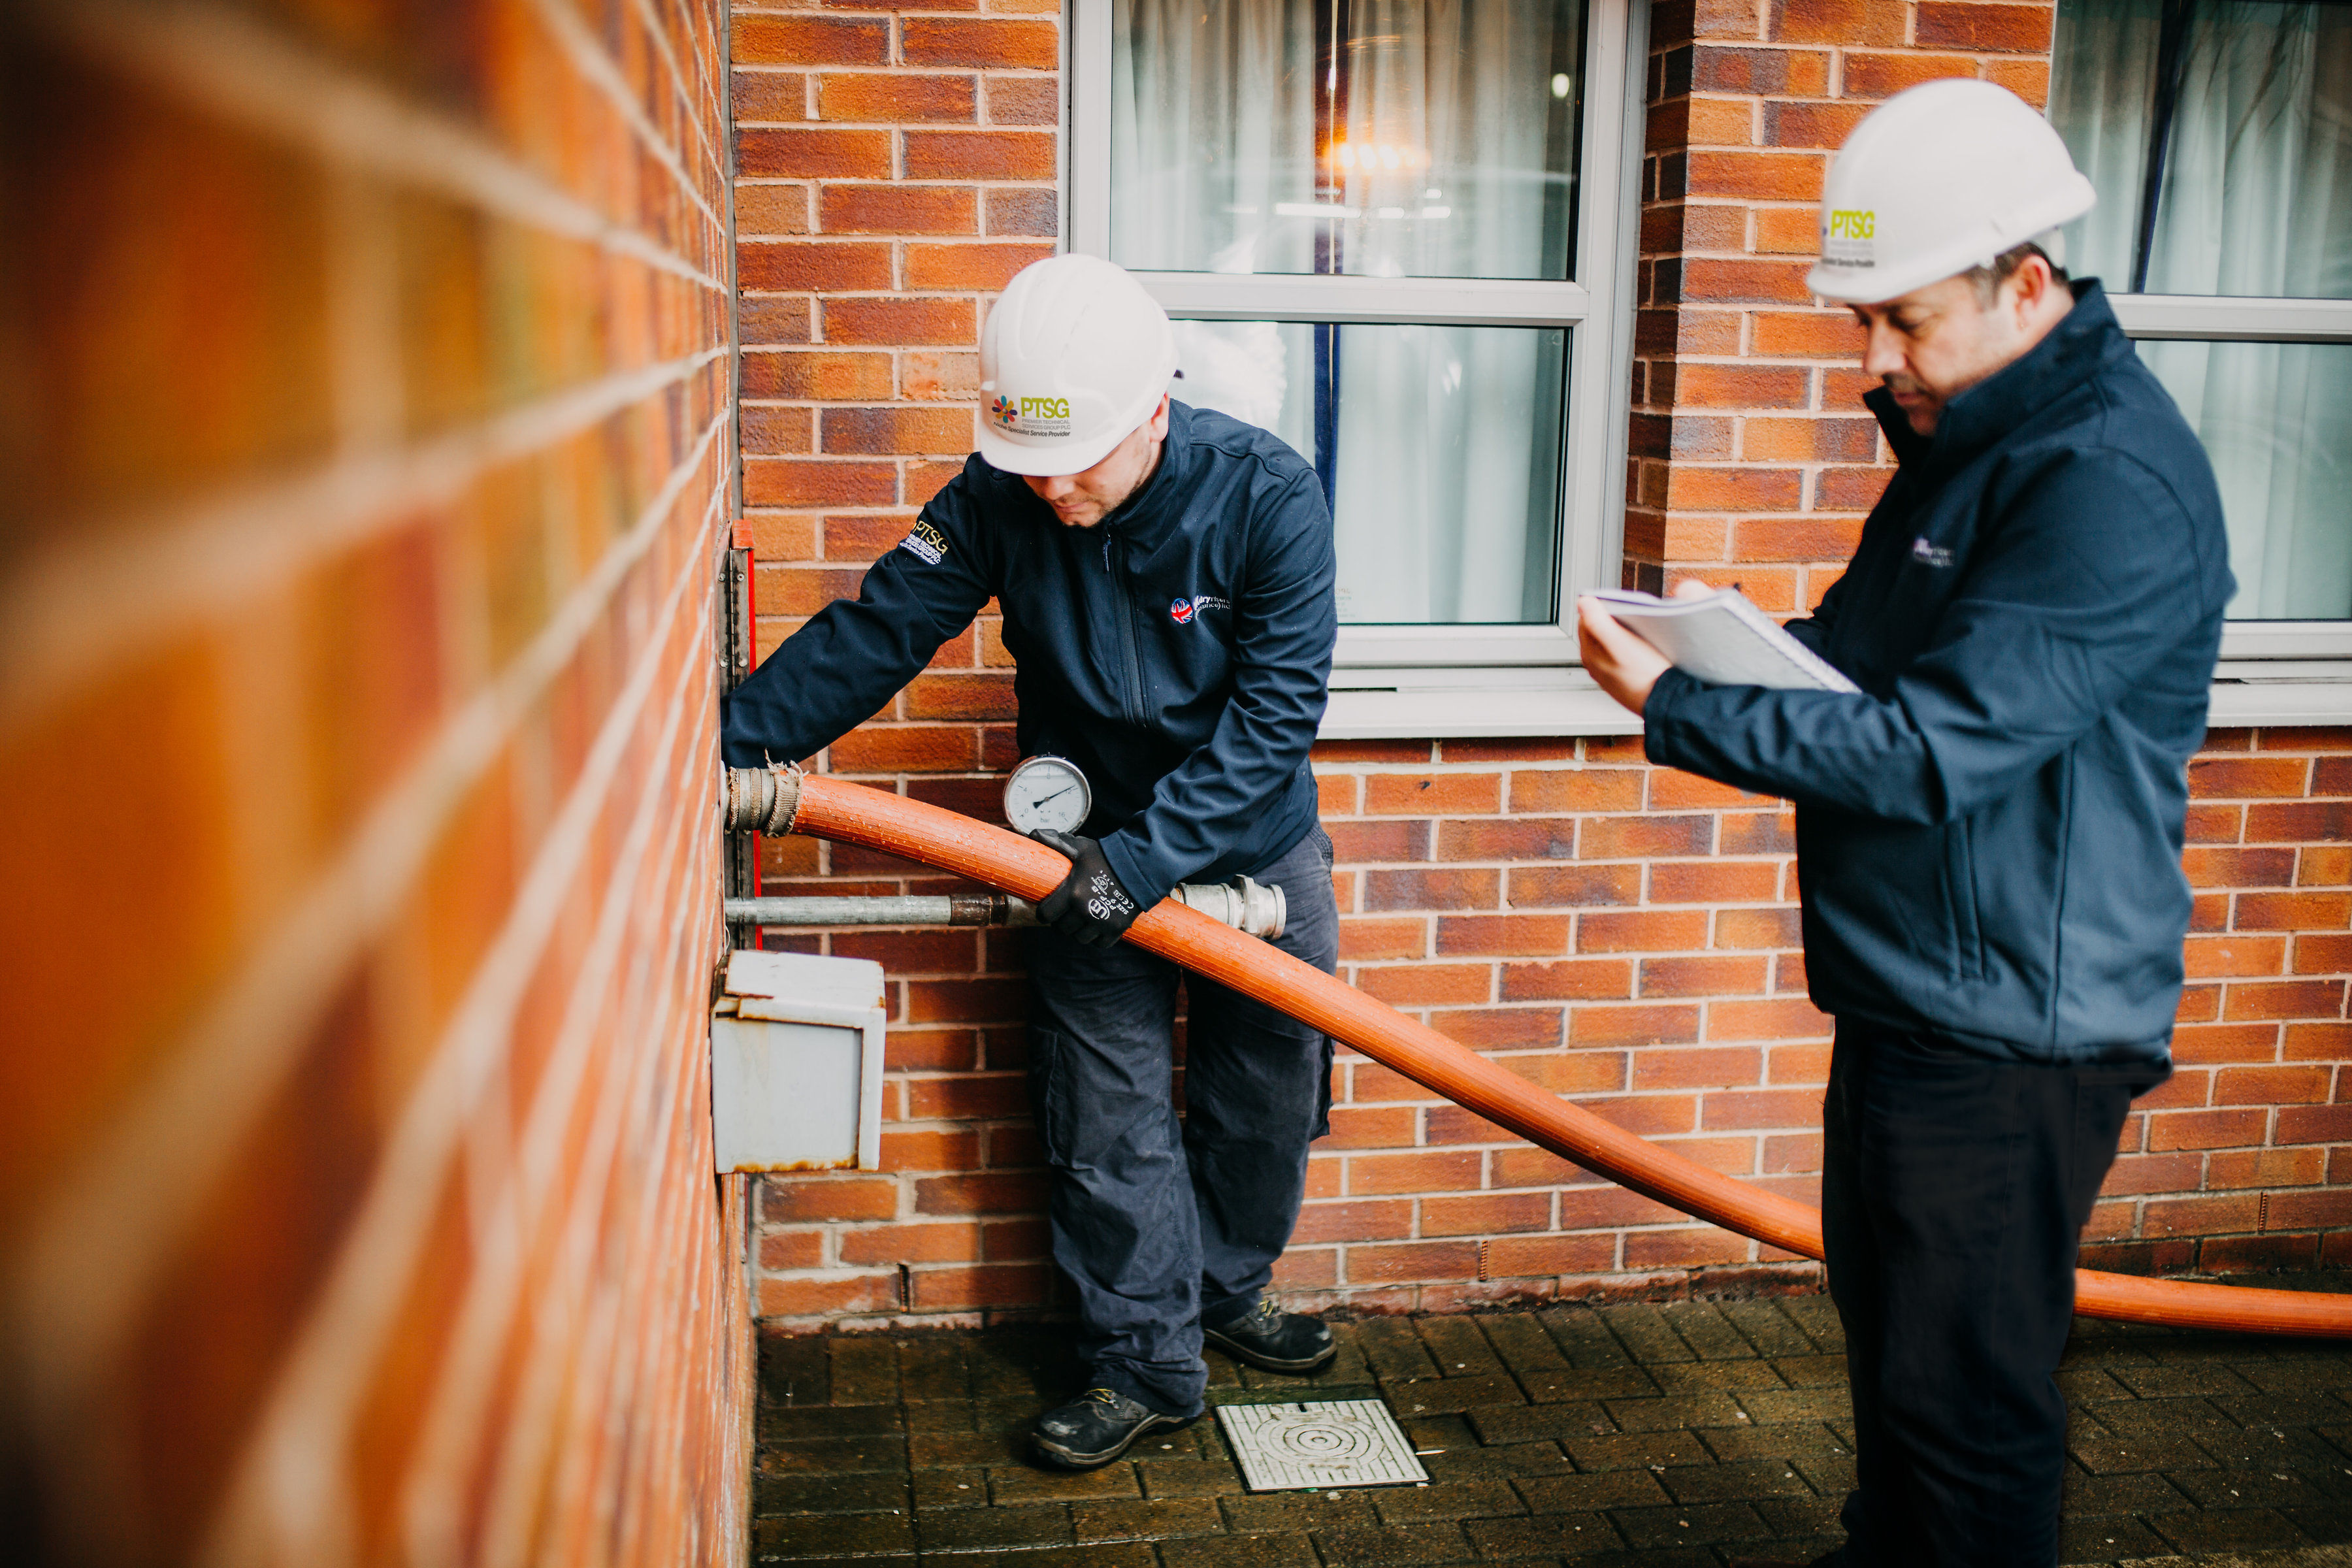 PTSG to make Crawley town centre regeneration scheme fire-safe